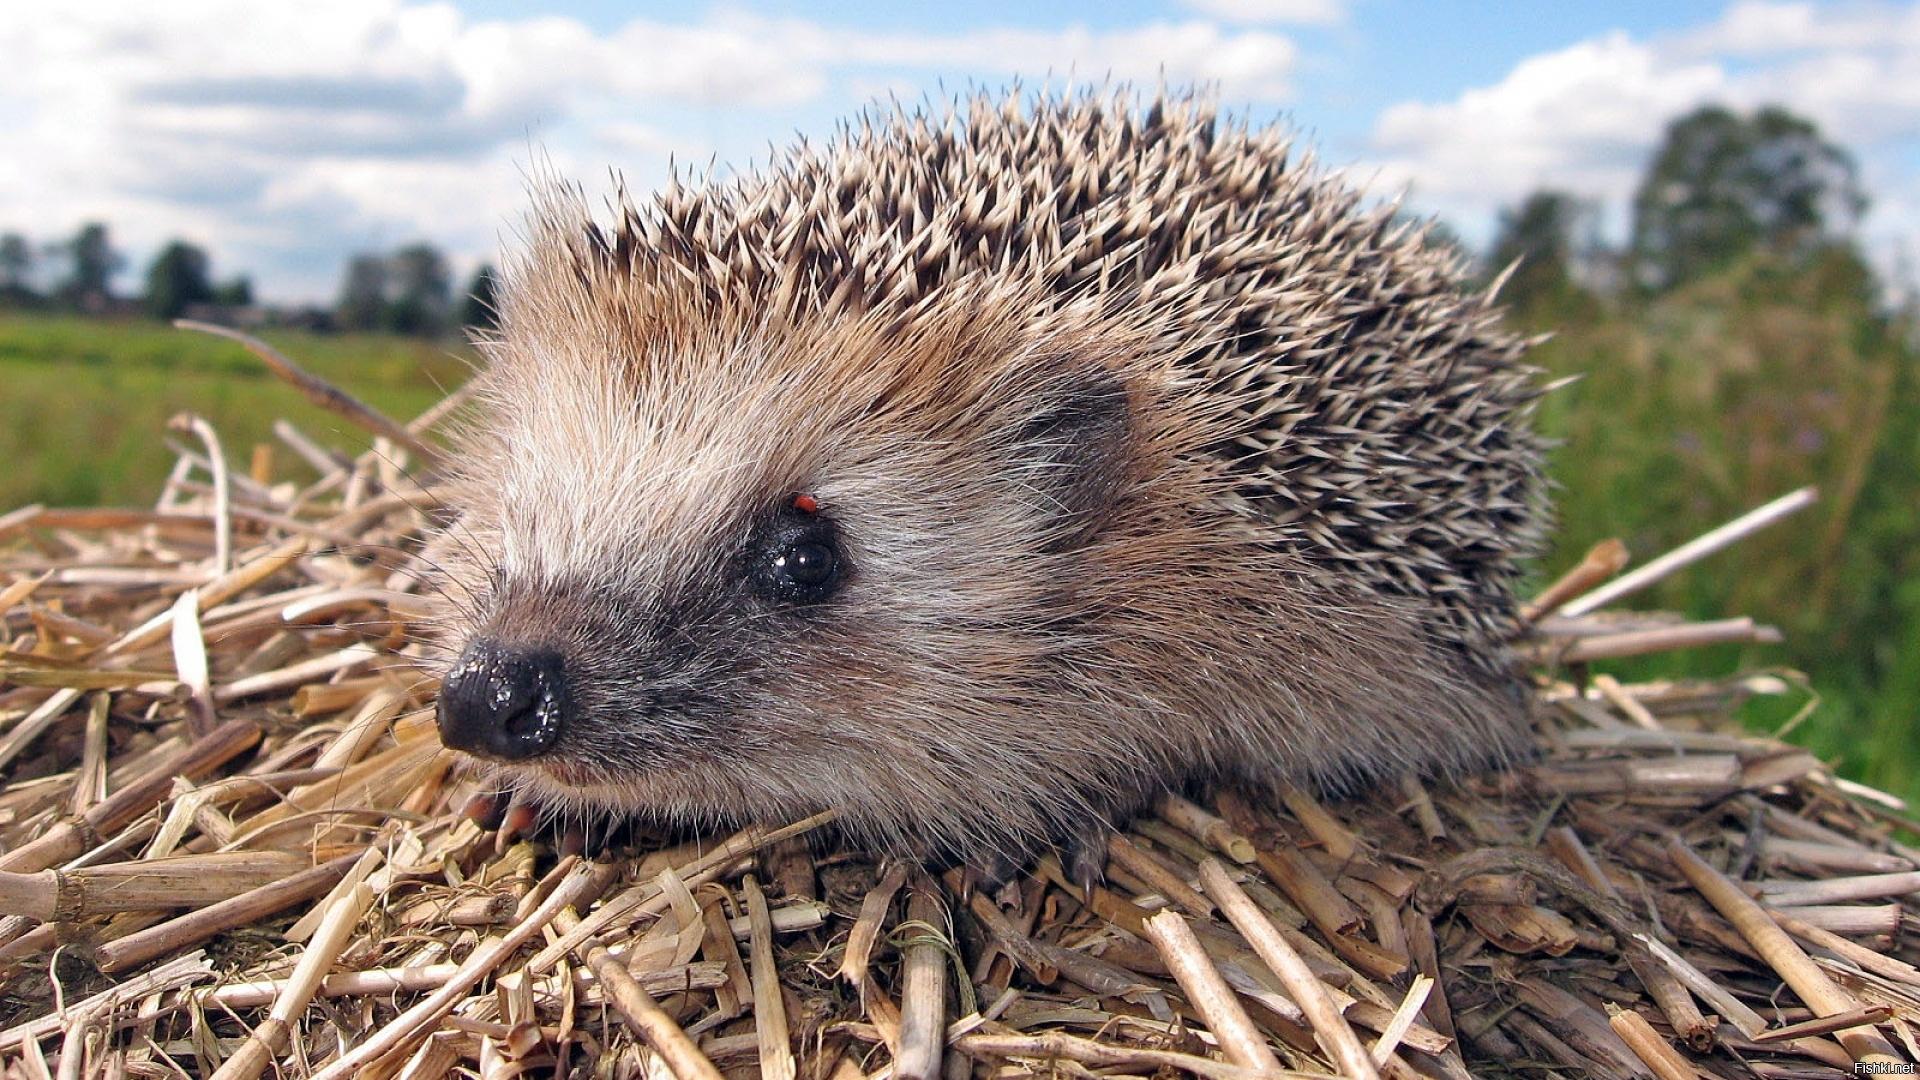 Hedgehog Pic